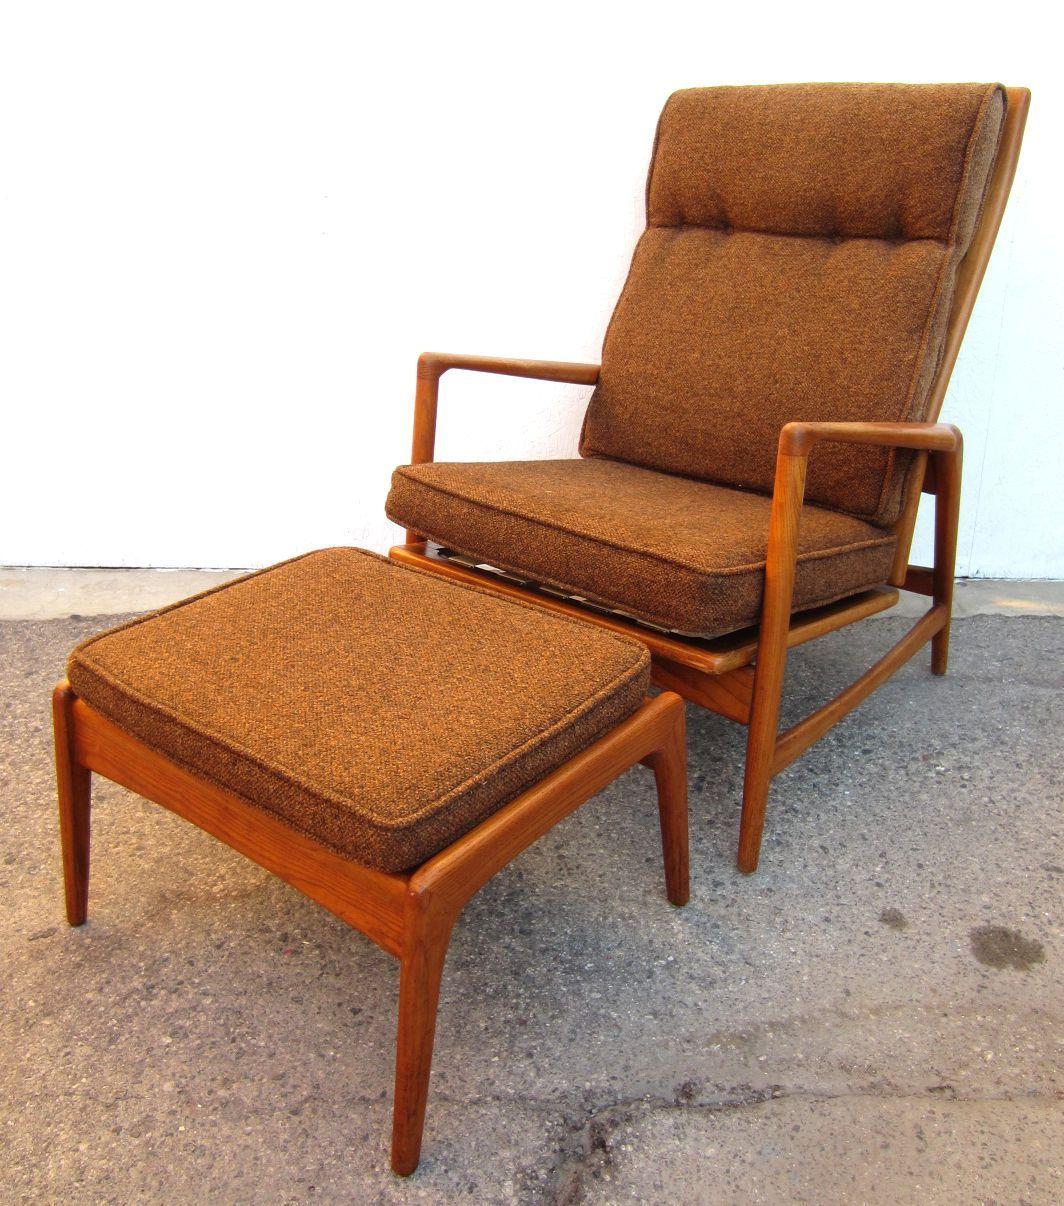 1950 Danish MidCentury Modern Lounge Chair and Ottoman Ib Kofod